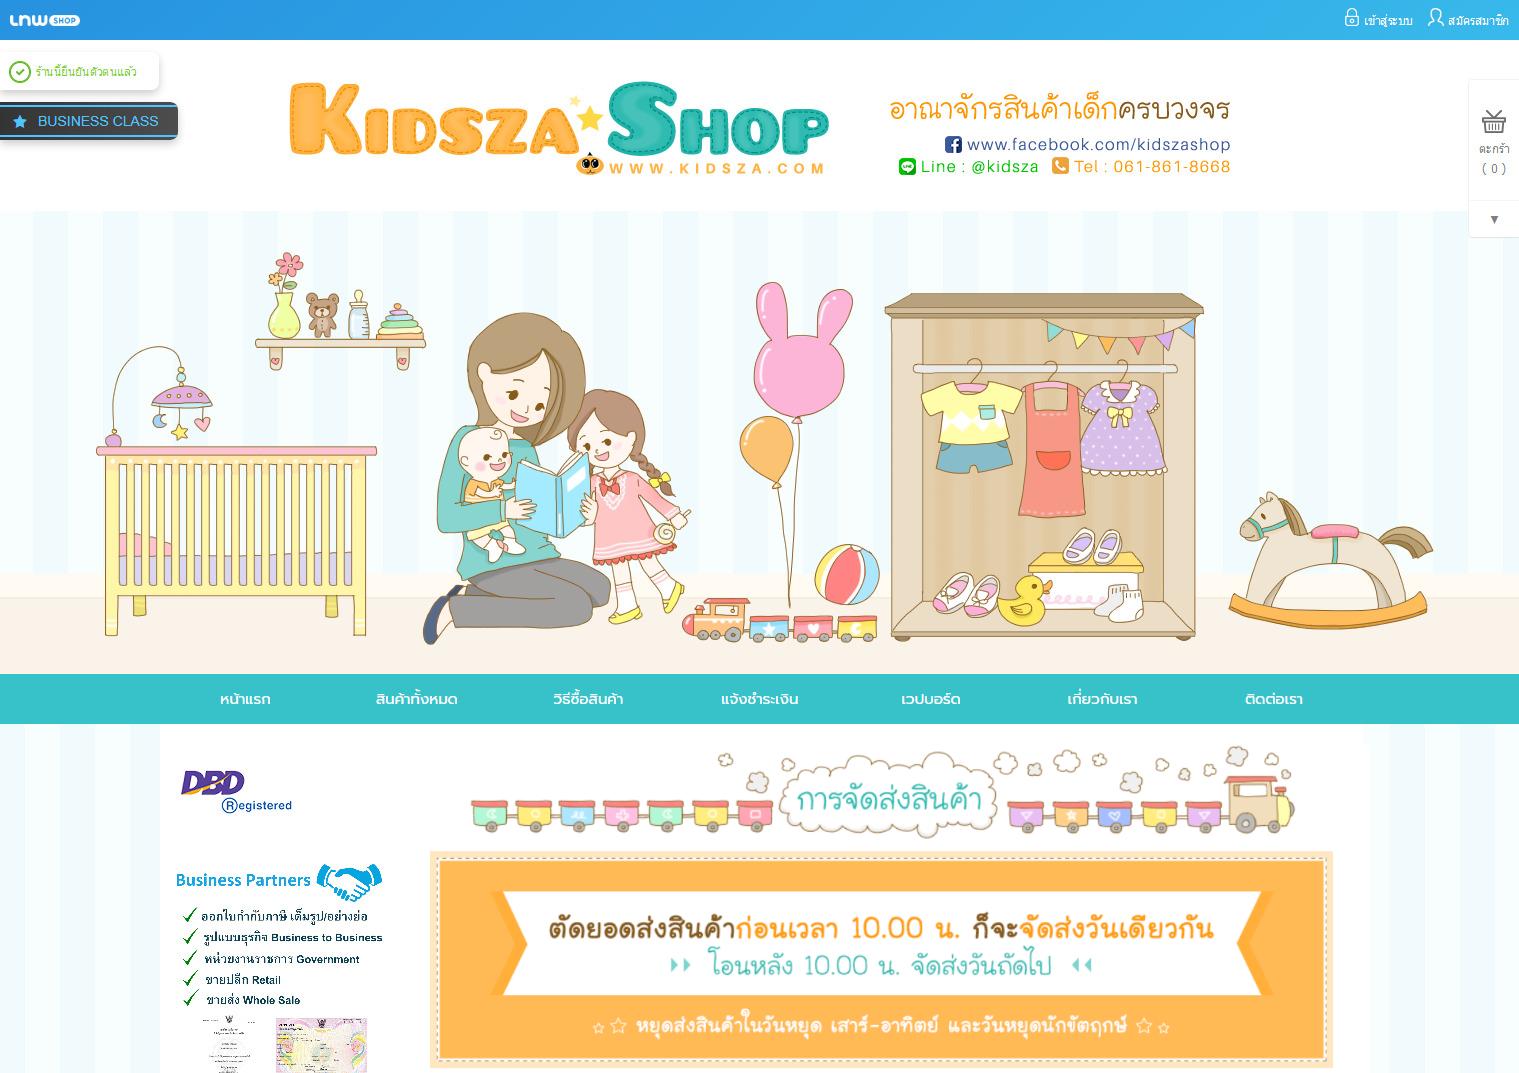 Kidsza Shop - Website